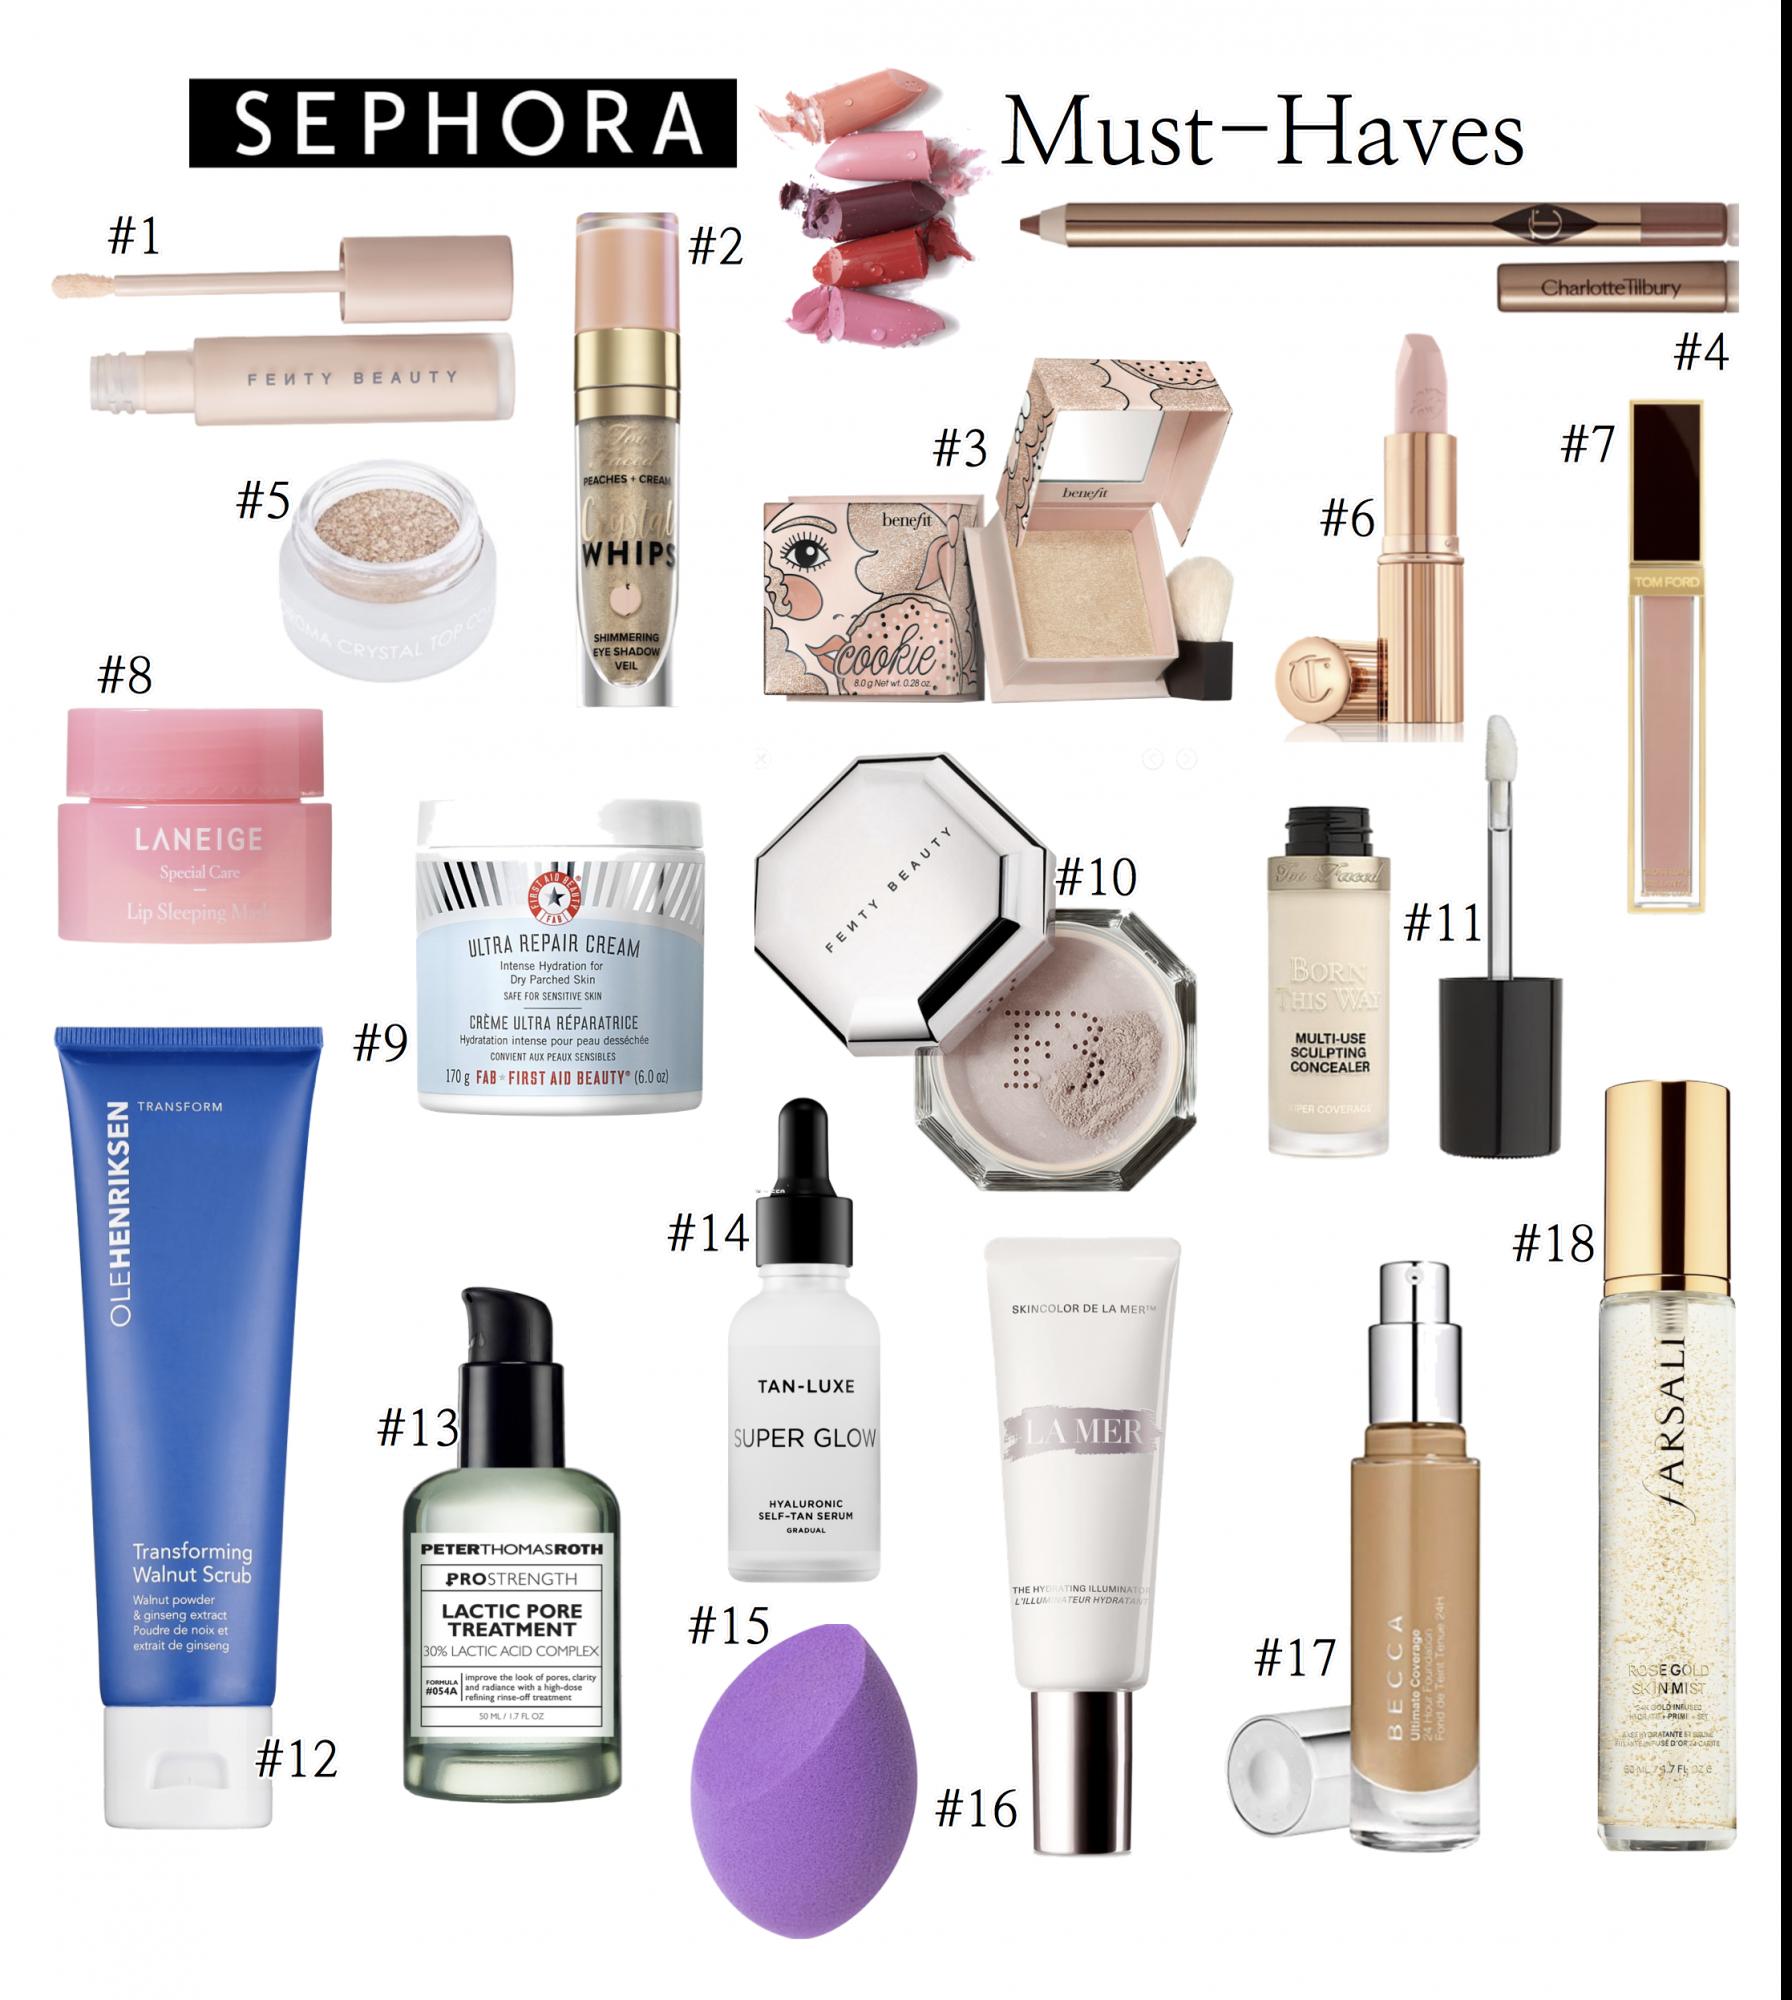 Sephora VIB Event MustHaves Sephora, Beauty sponge